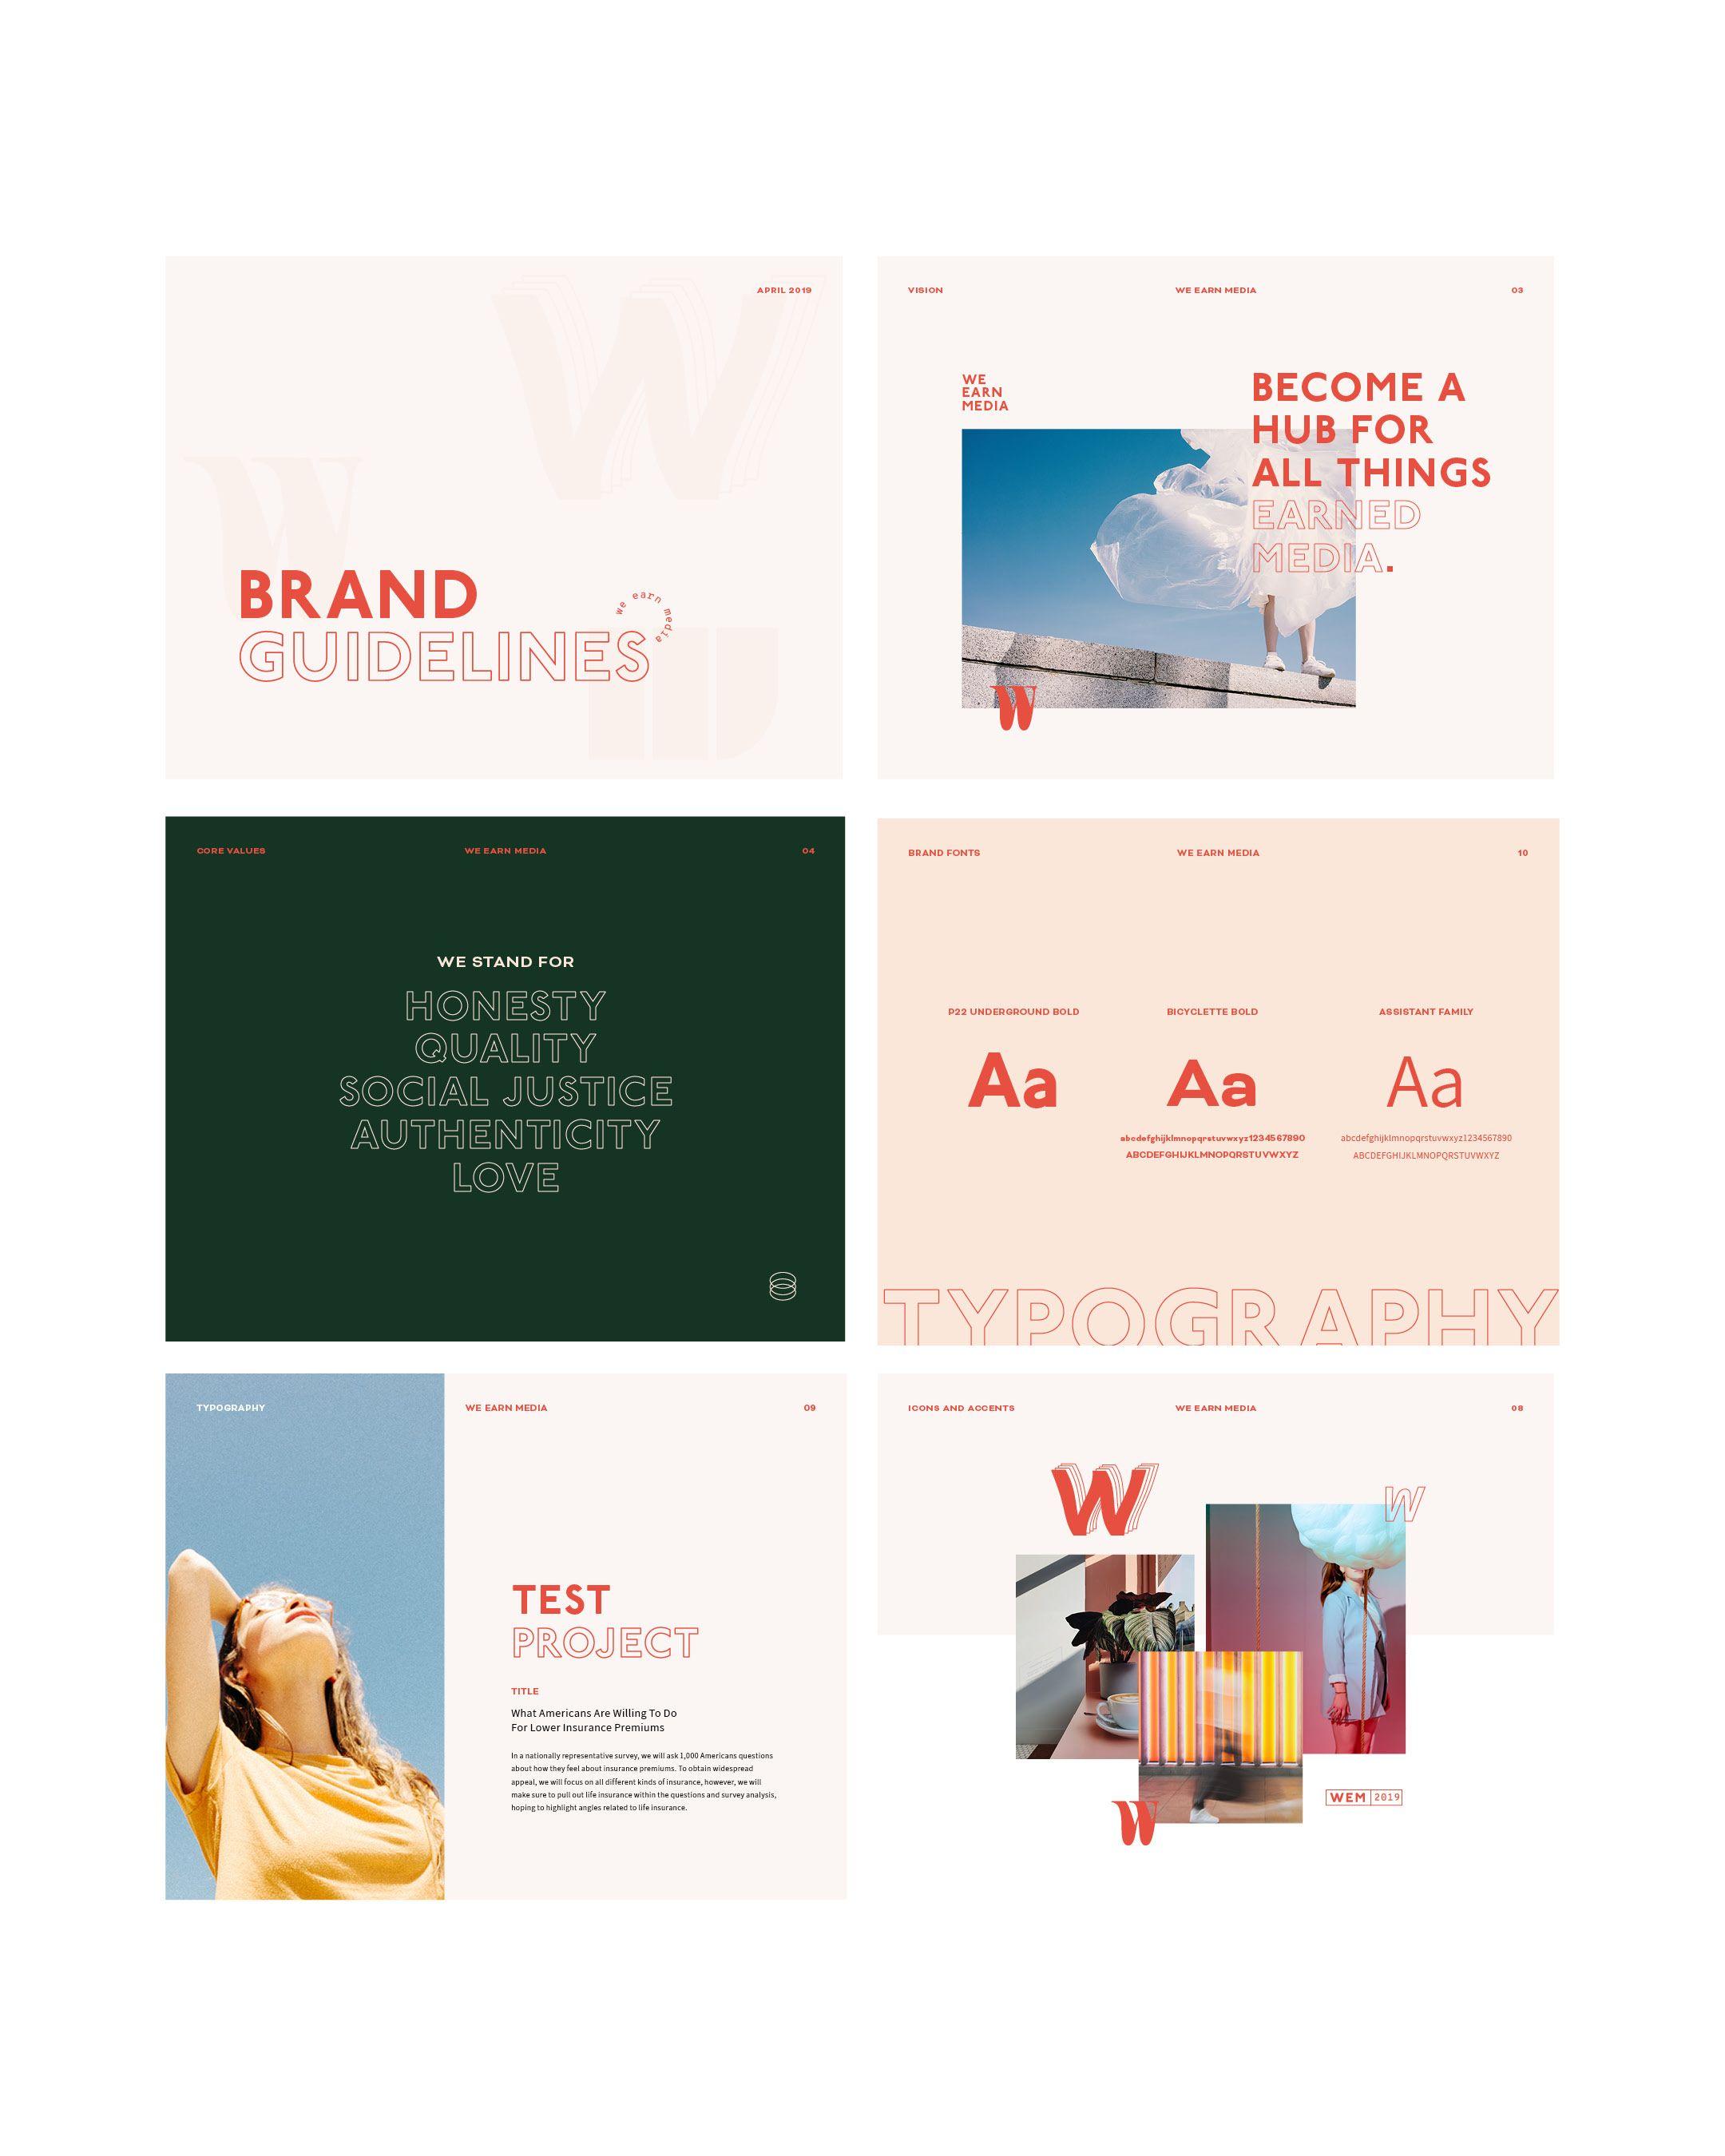 We Earn Media Branding Guidelines Bridge Bloom Brand Guidelines Design Brand Guidelines Graphic Design Branding